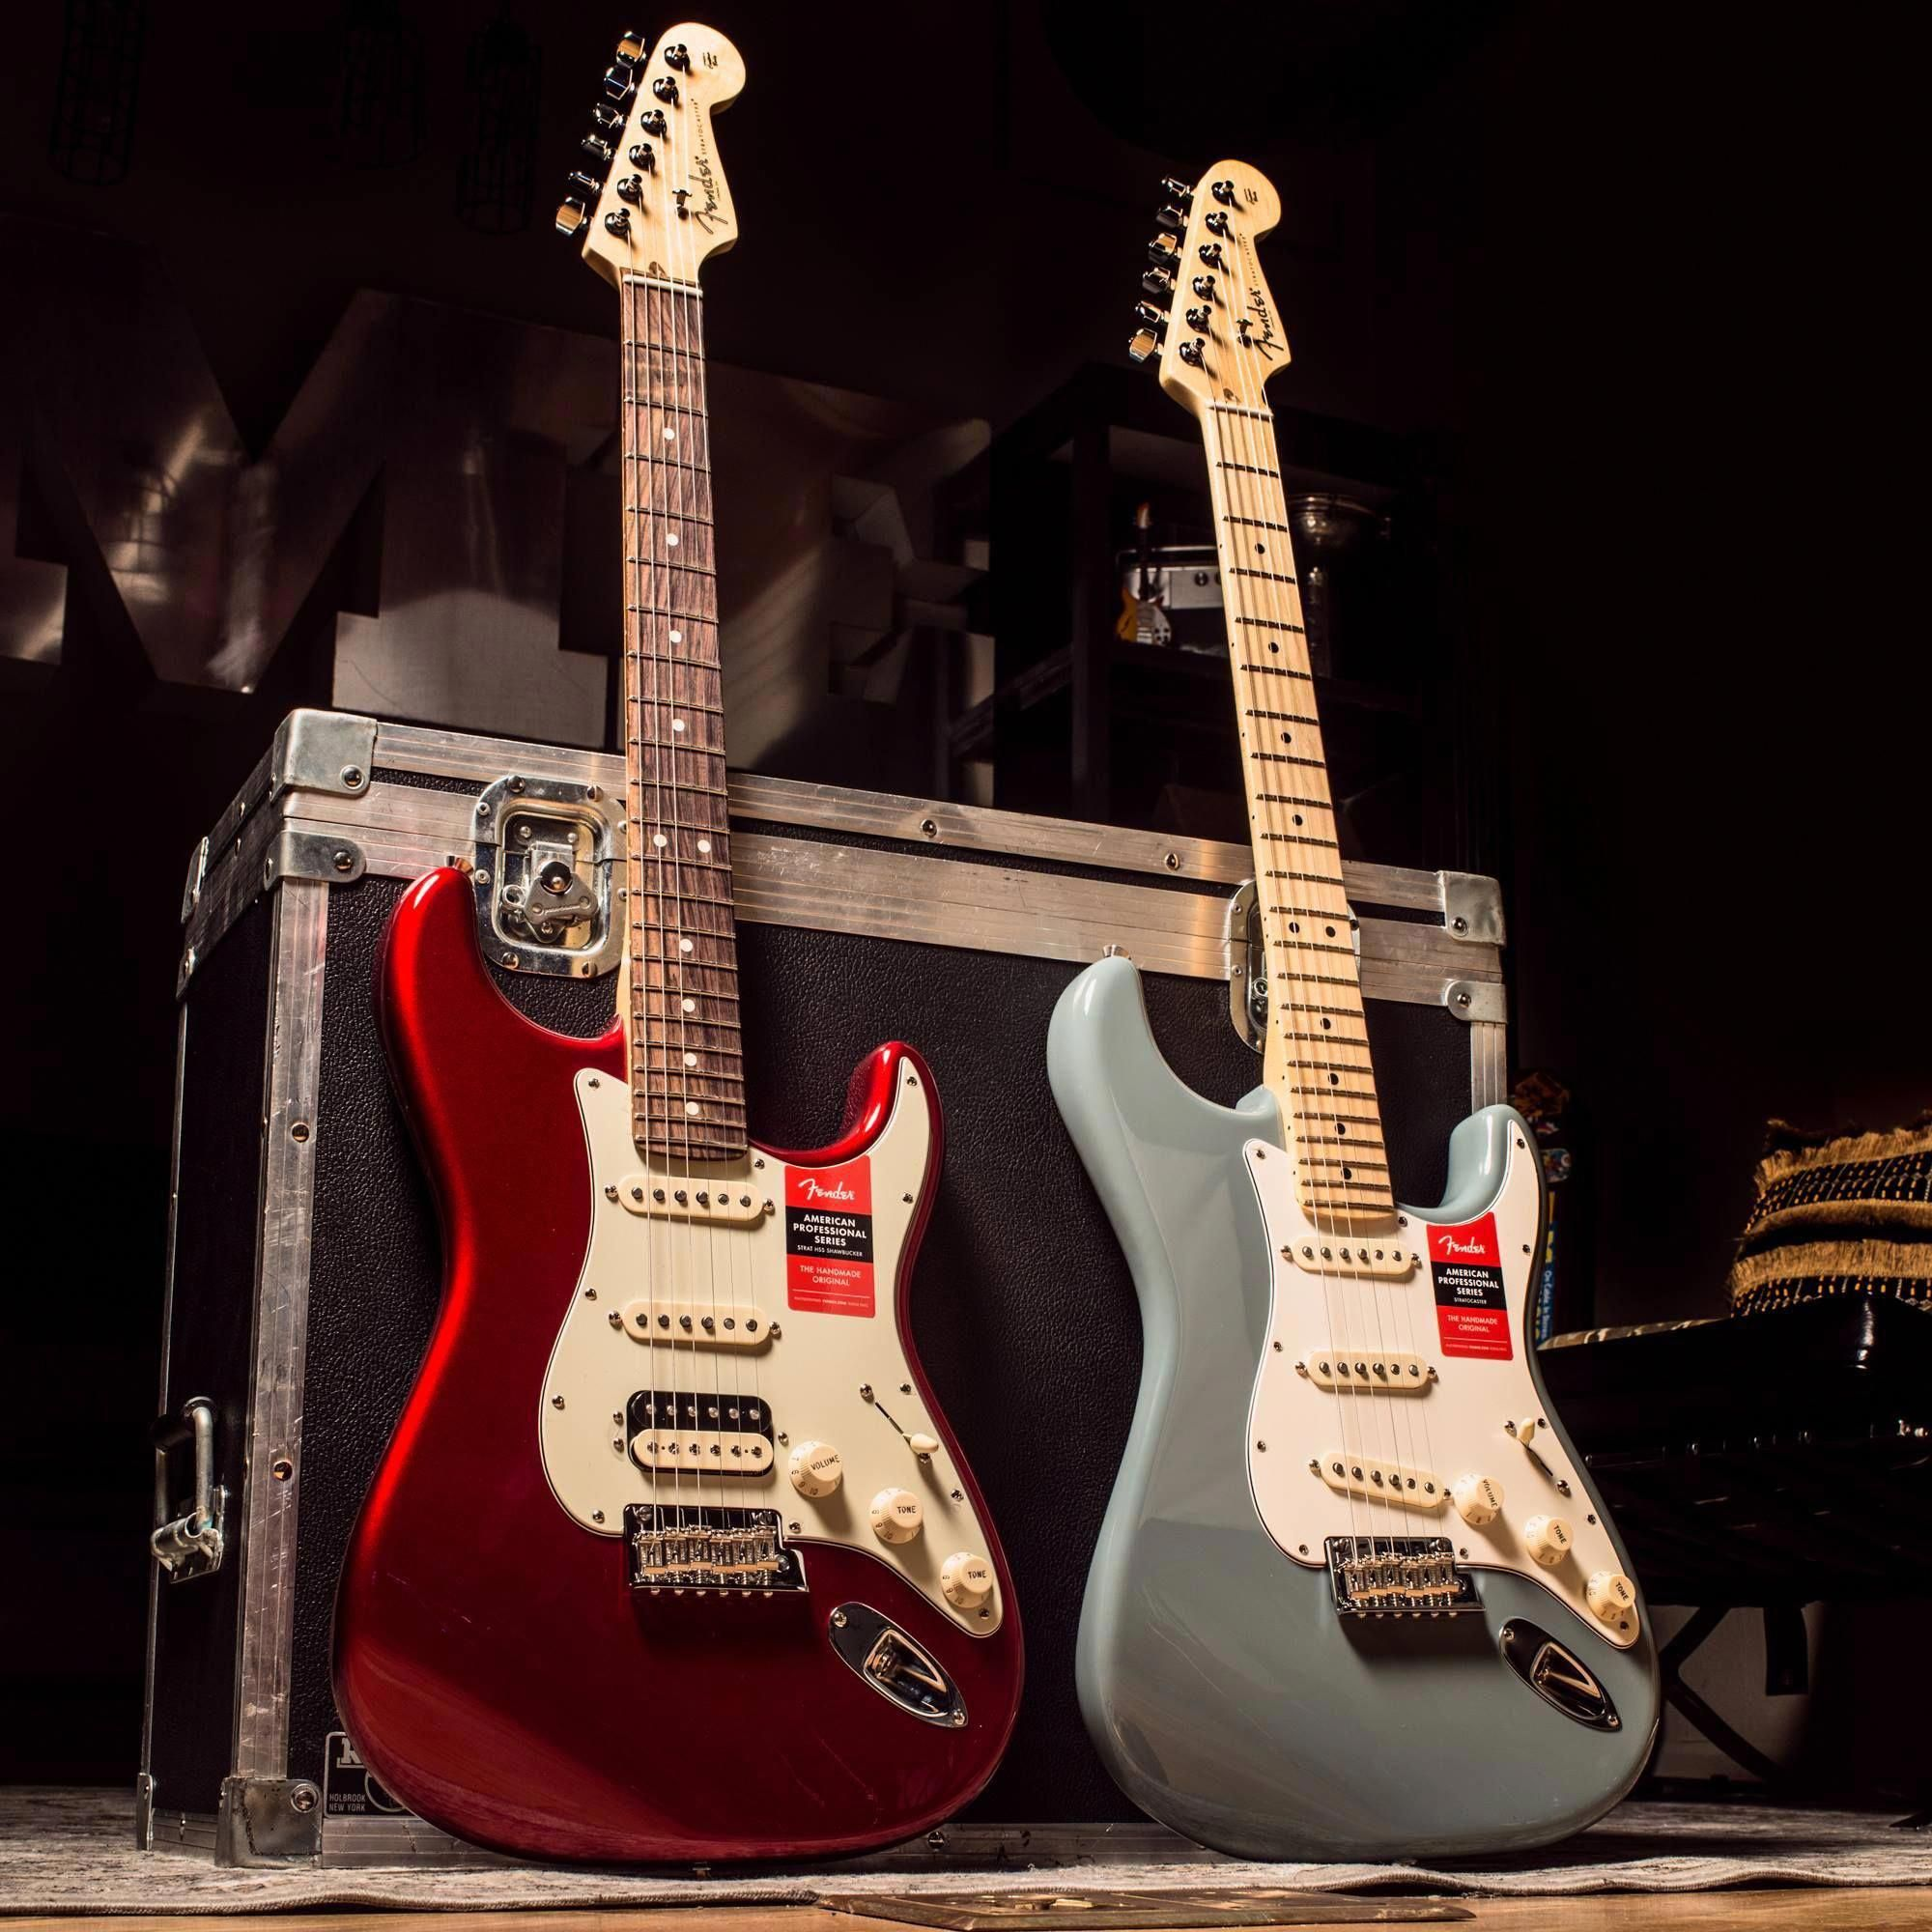 Fender Guitar Strings Electric Fender Guitar Picks Medium #guitarlegend #guitarstagram #FenderGuitars #fenderguitars